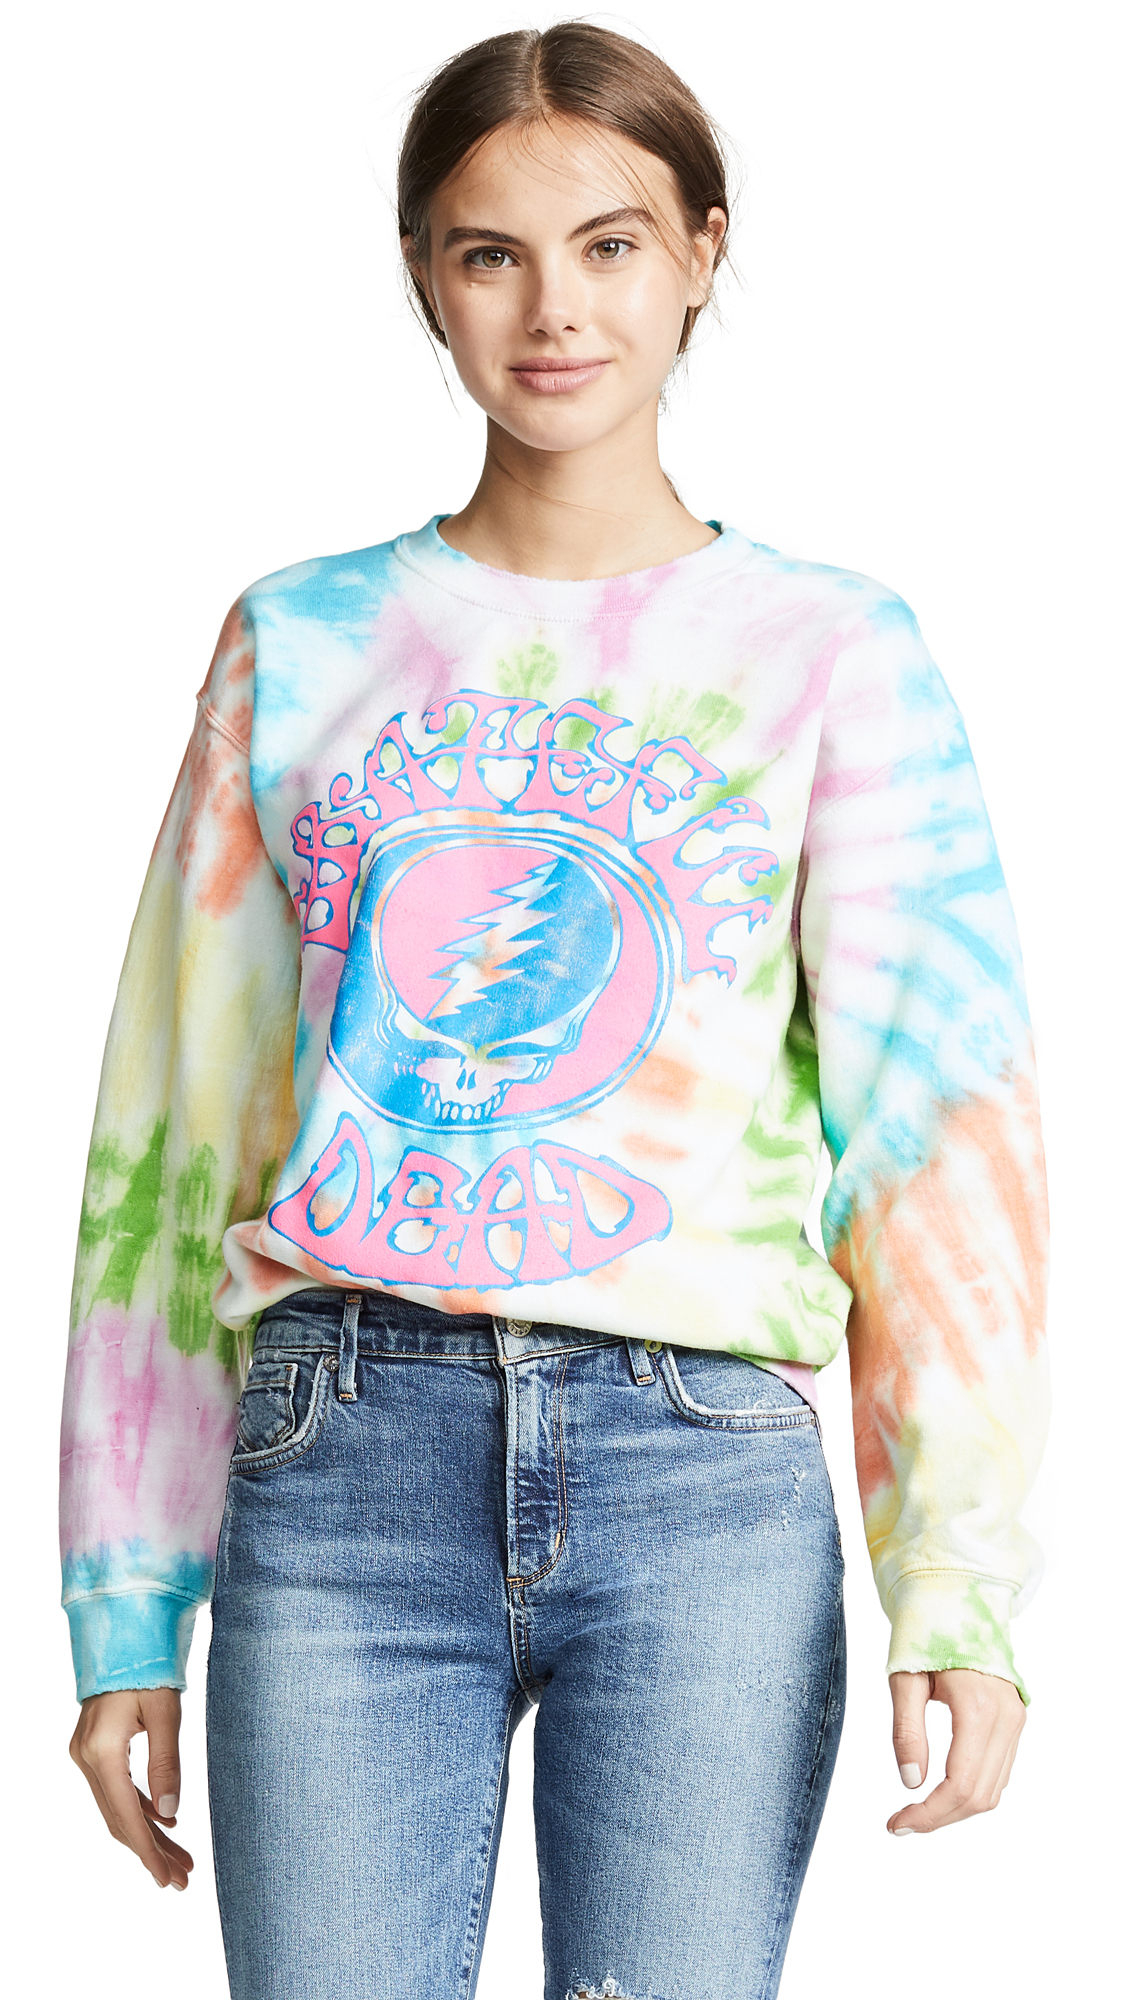 MADE WORN Grateful Dead Tie Dye Sweatshirt